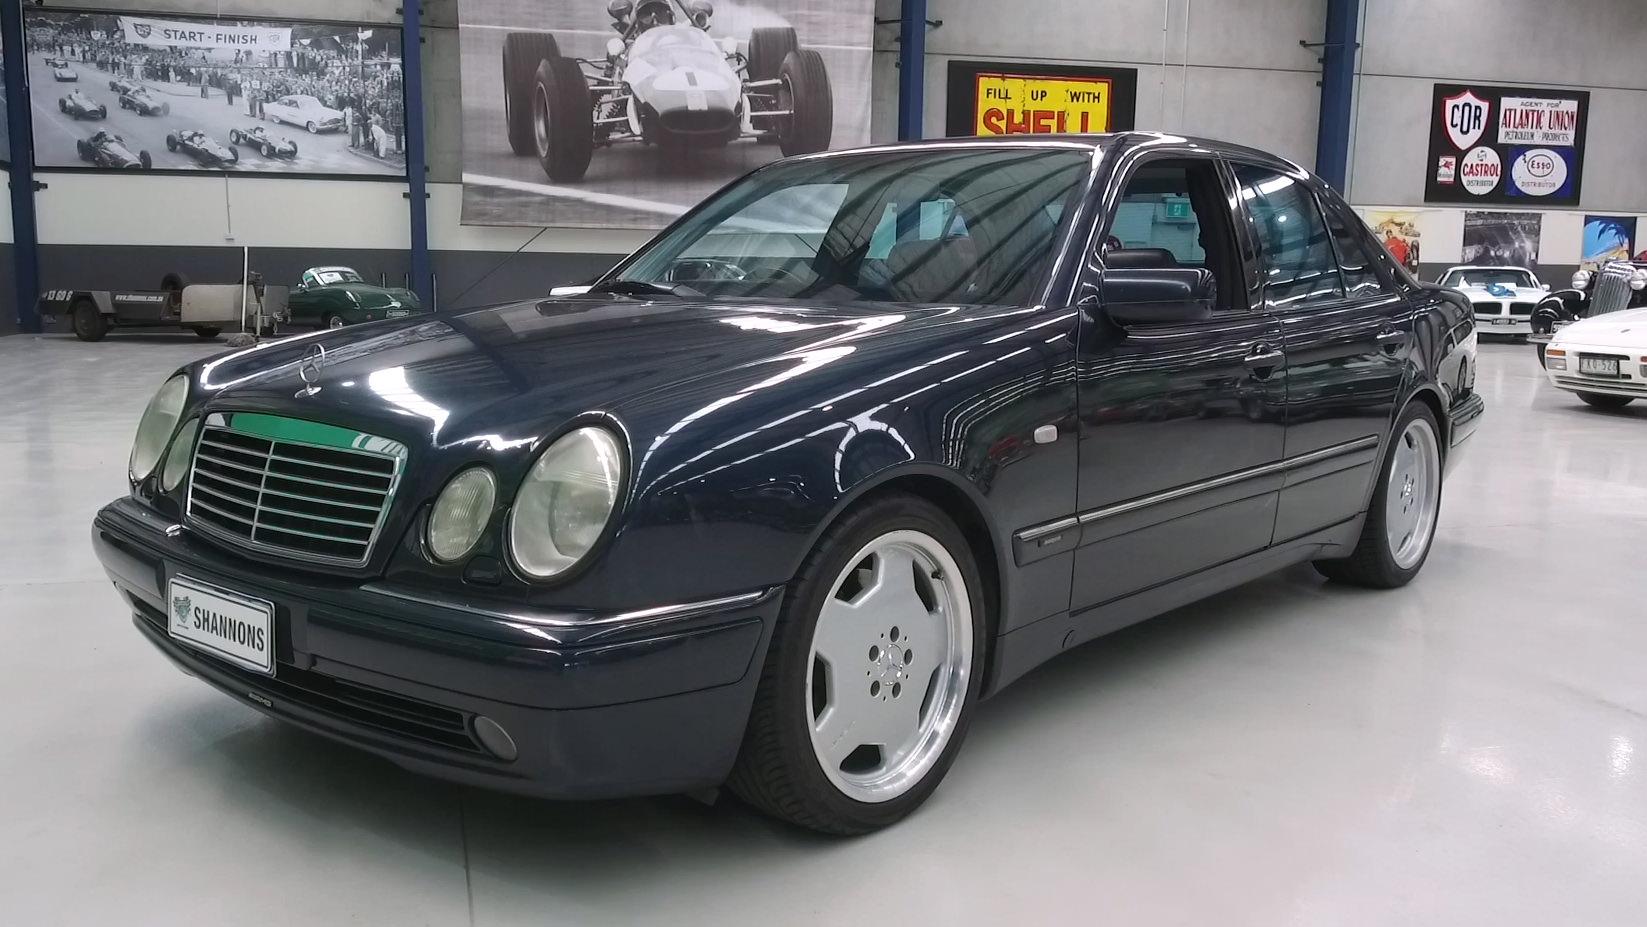 1998 Mercedes-Benz E55 AMG Sedan - 2021 Shannons Summer Timed Online Auction